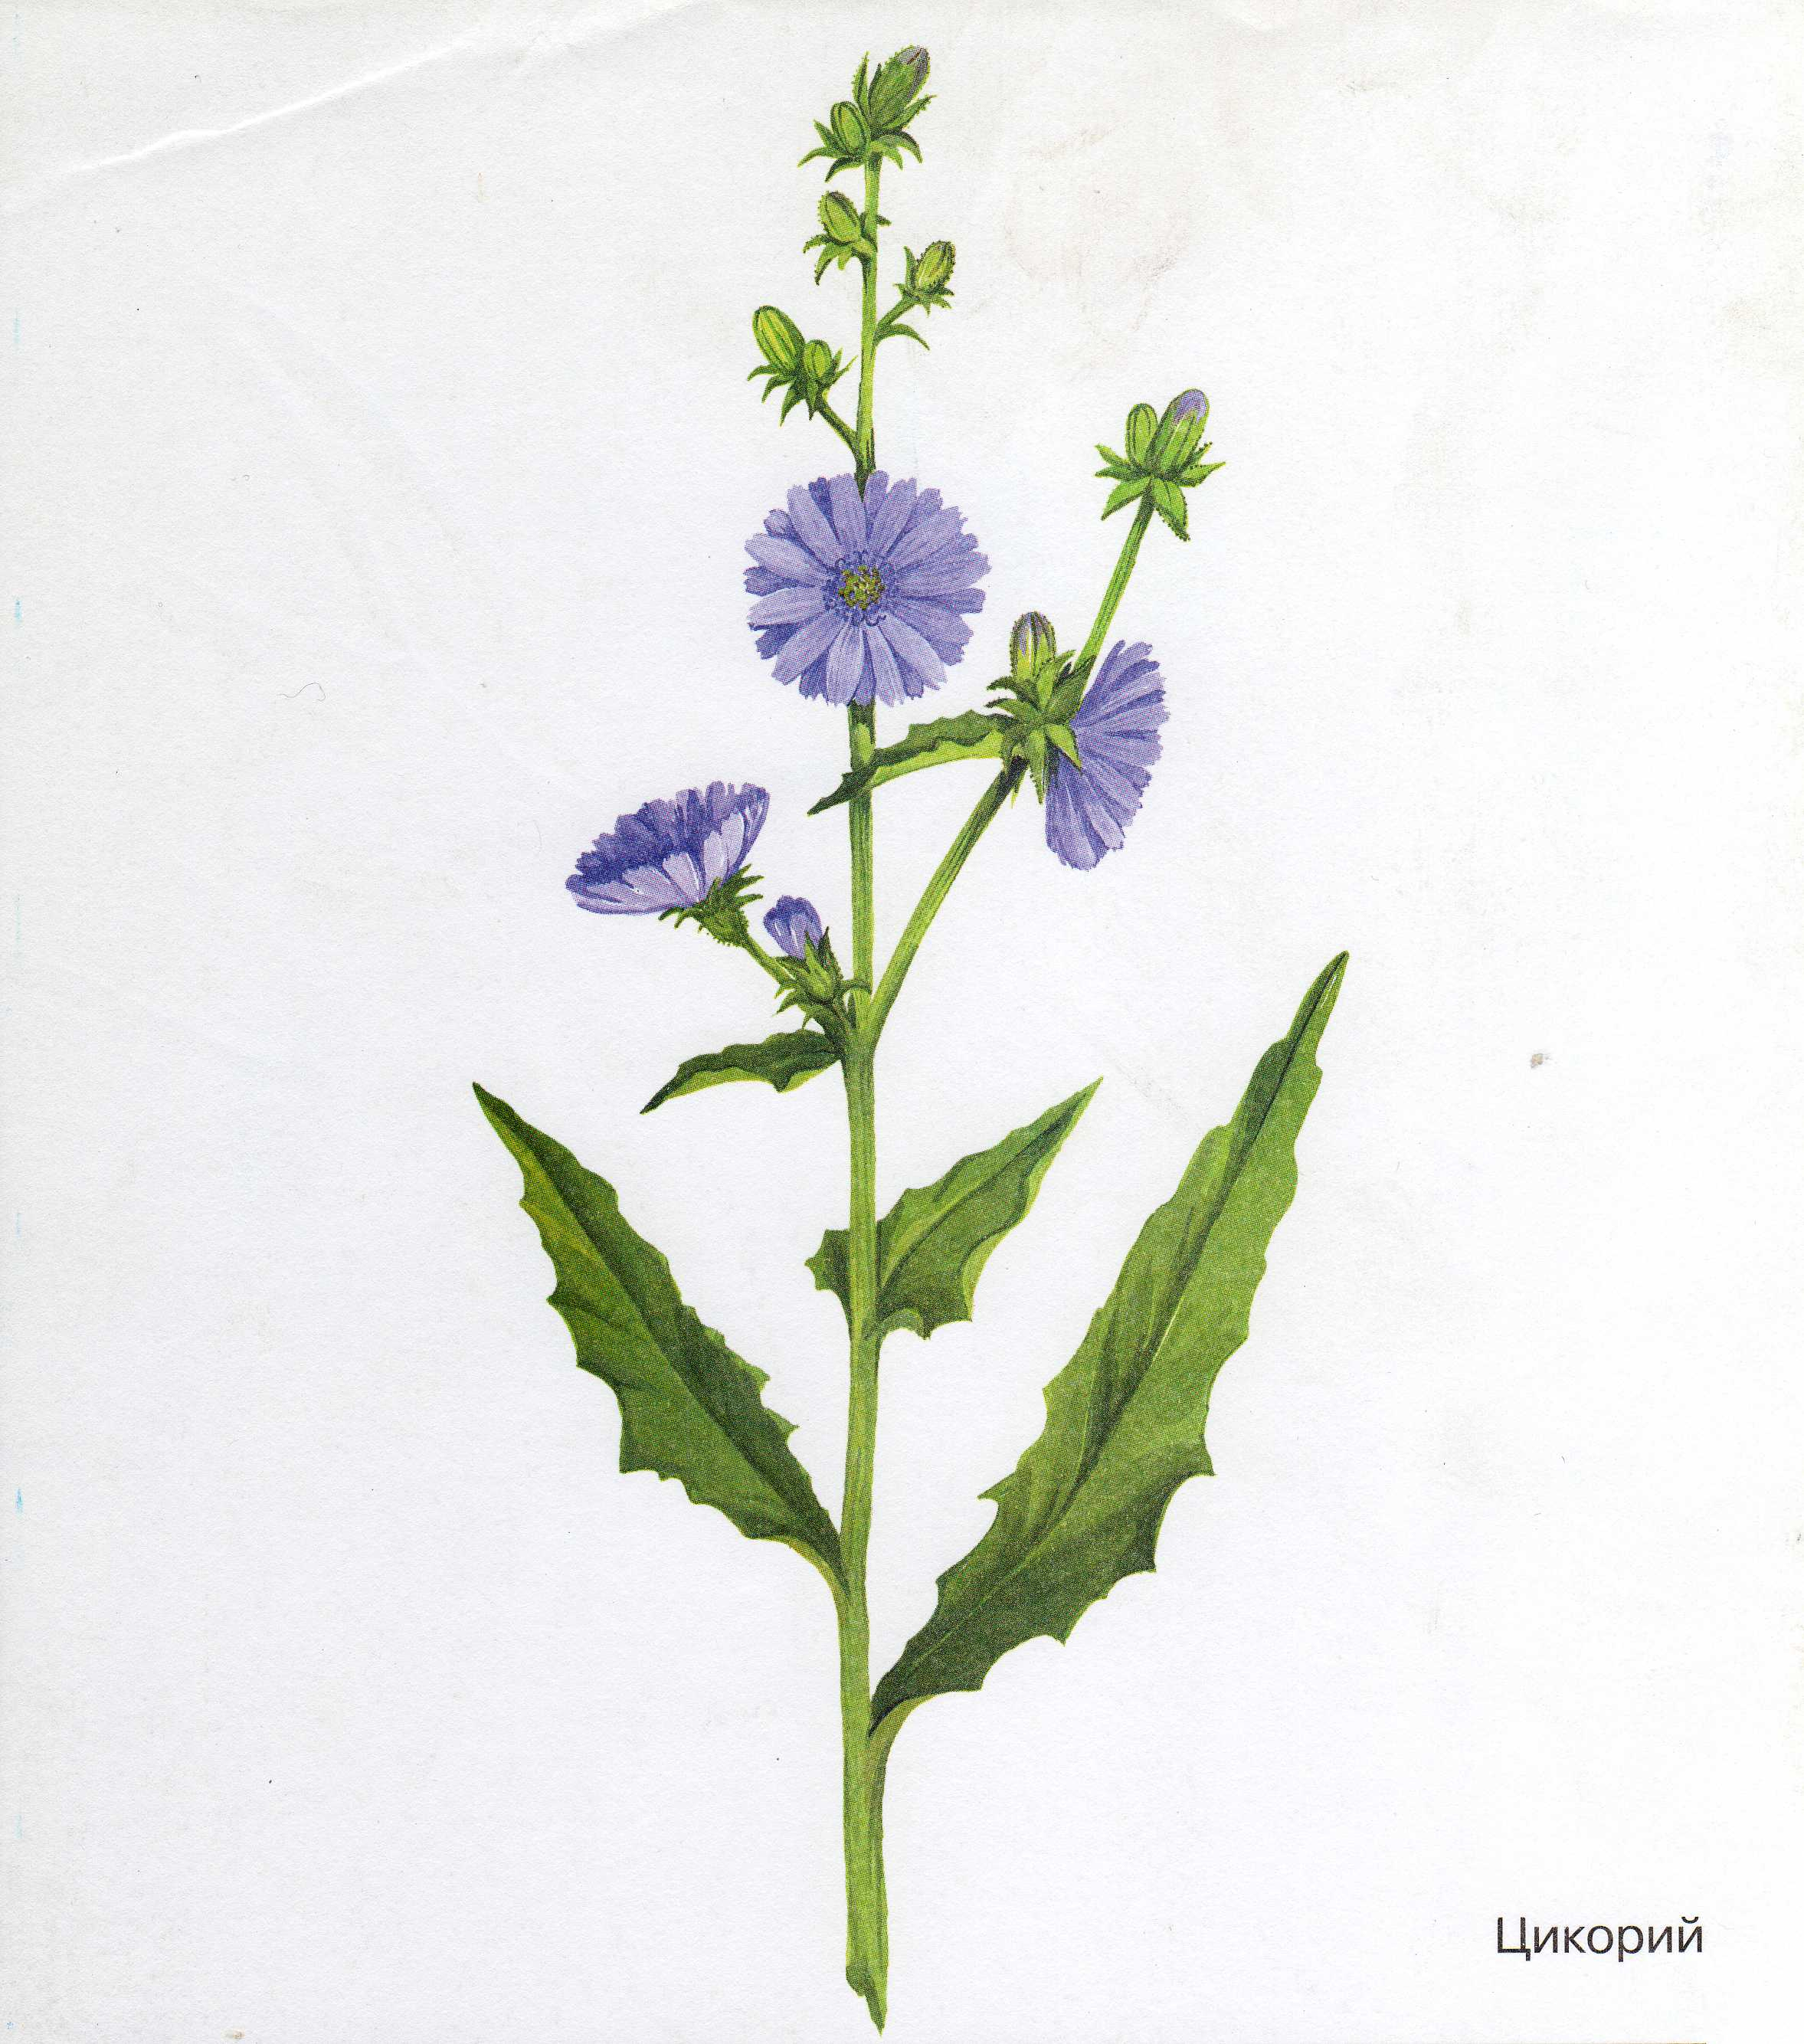 http://dasha46.narod.ru/Encyclopedic_Knowledge/Biology/Plants/Herbs/Chicory.jpg